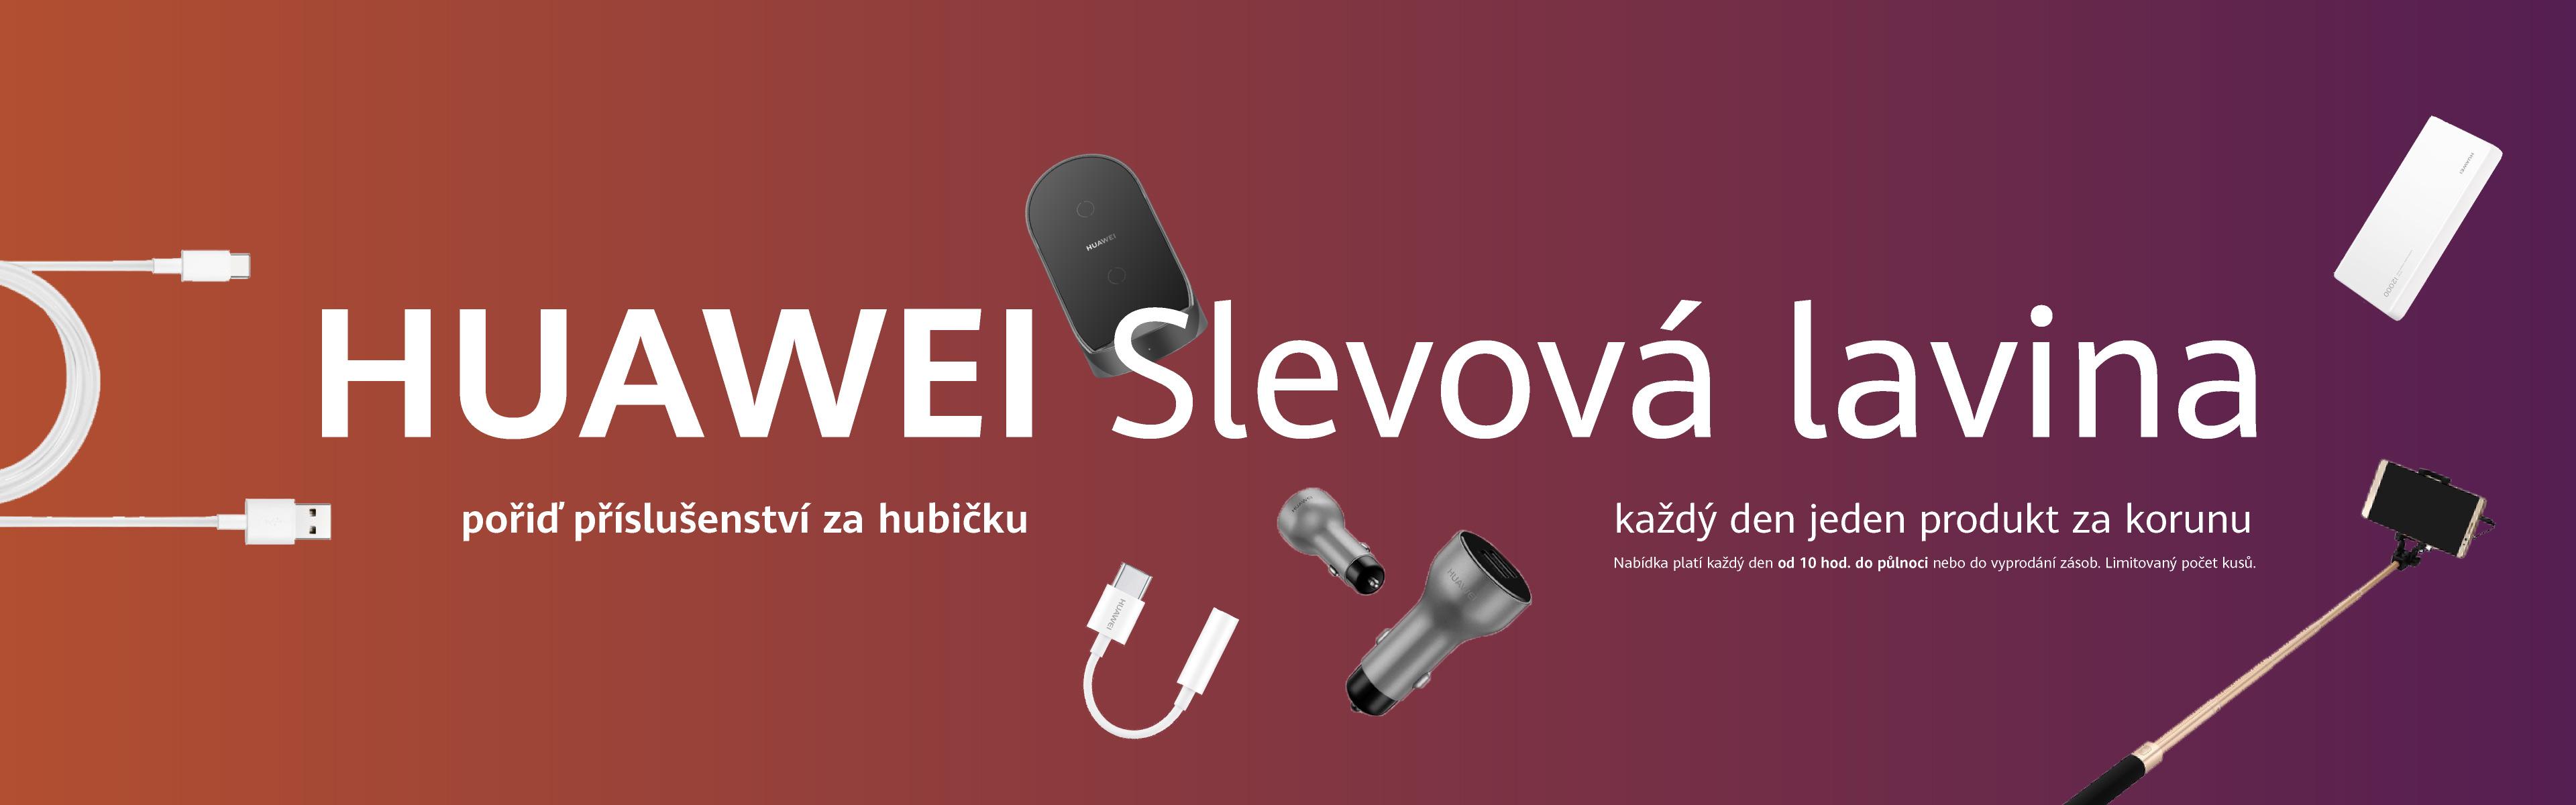 accessories-1-czk